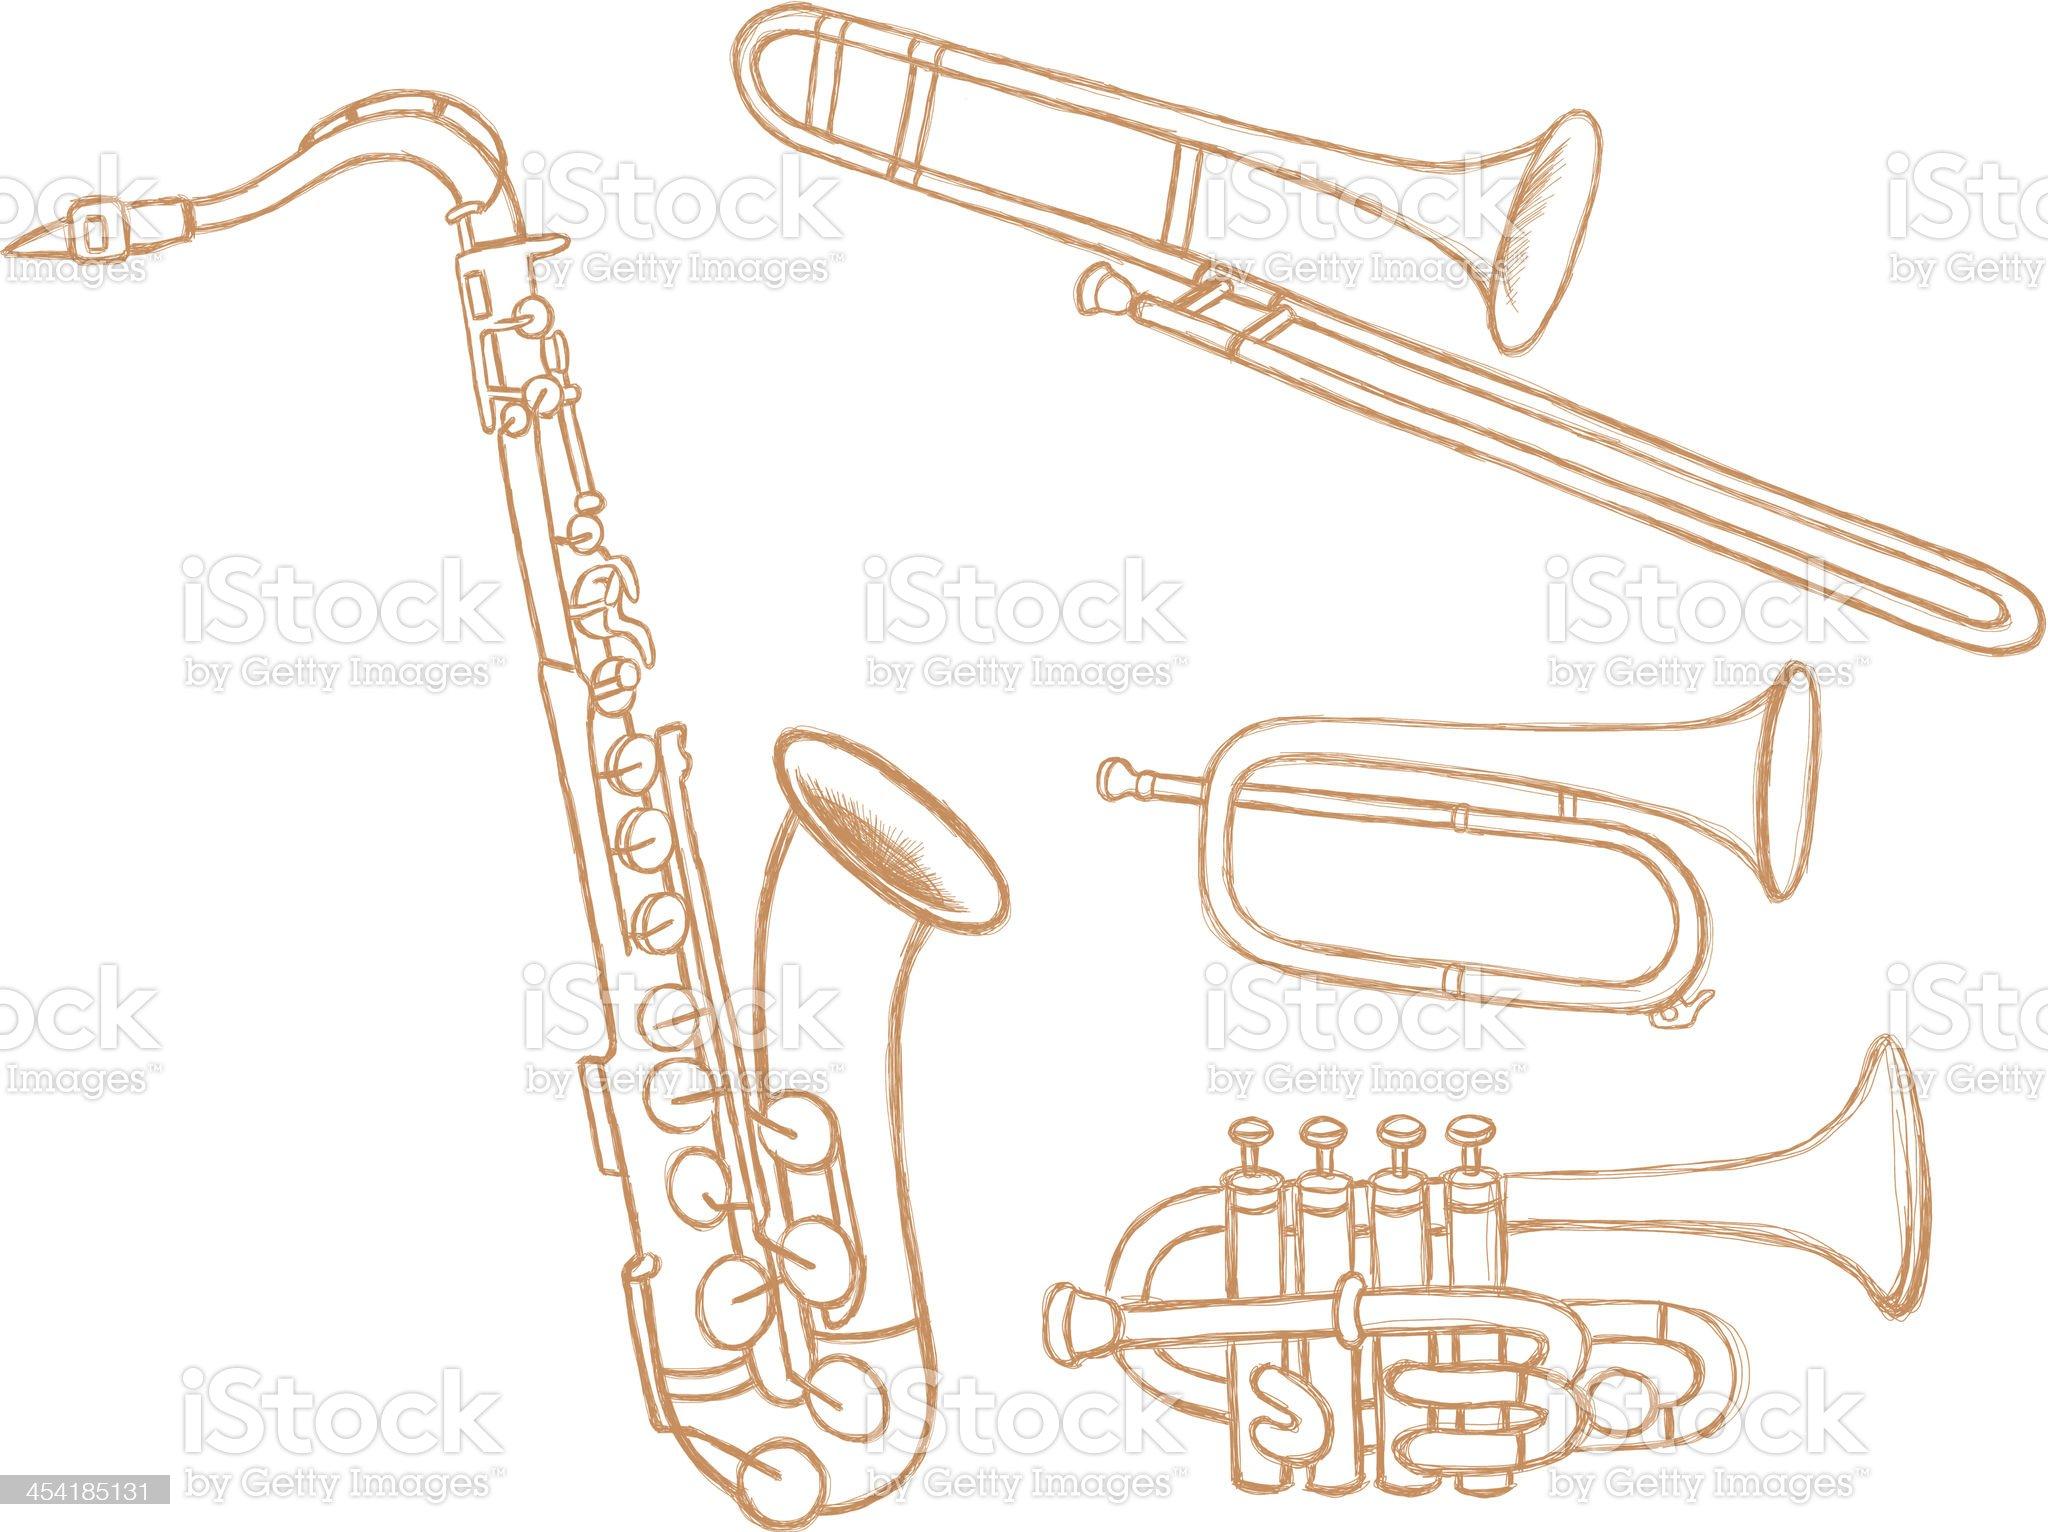 Brass Instruments Doodles royalty-free stock vector art